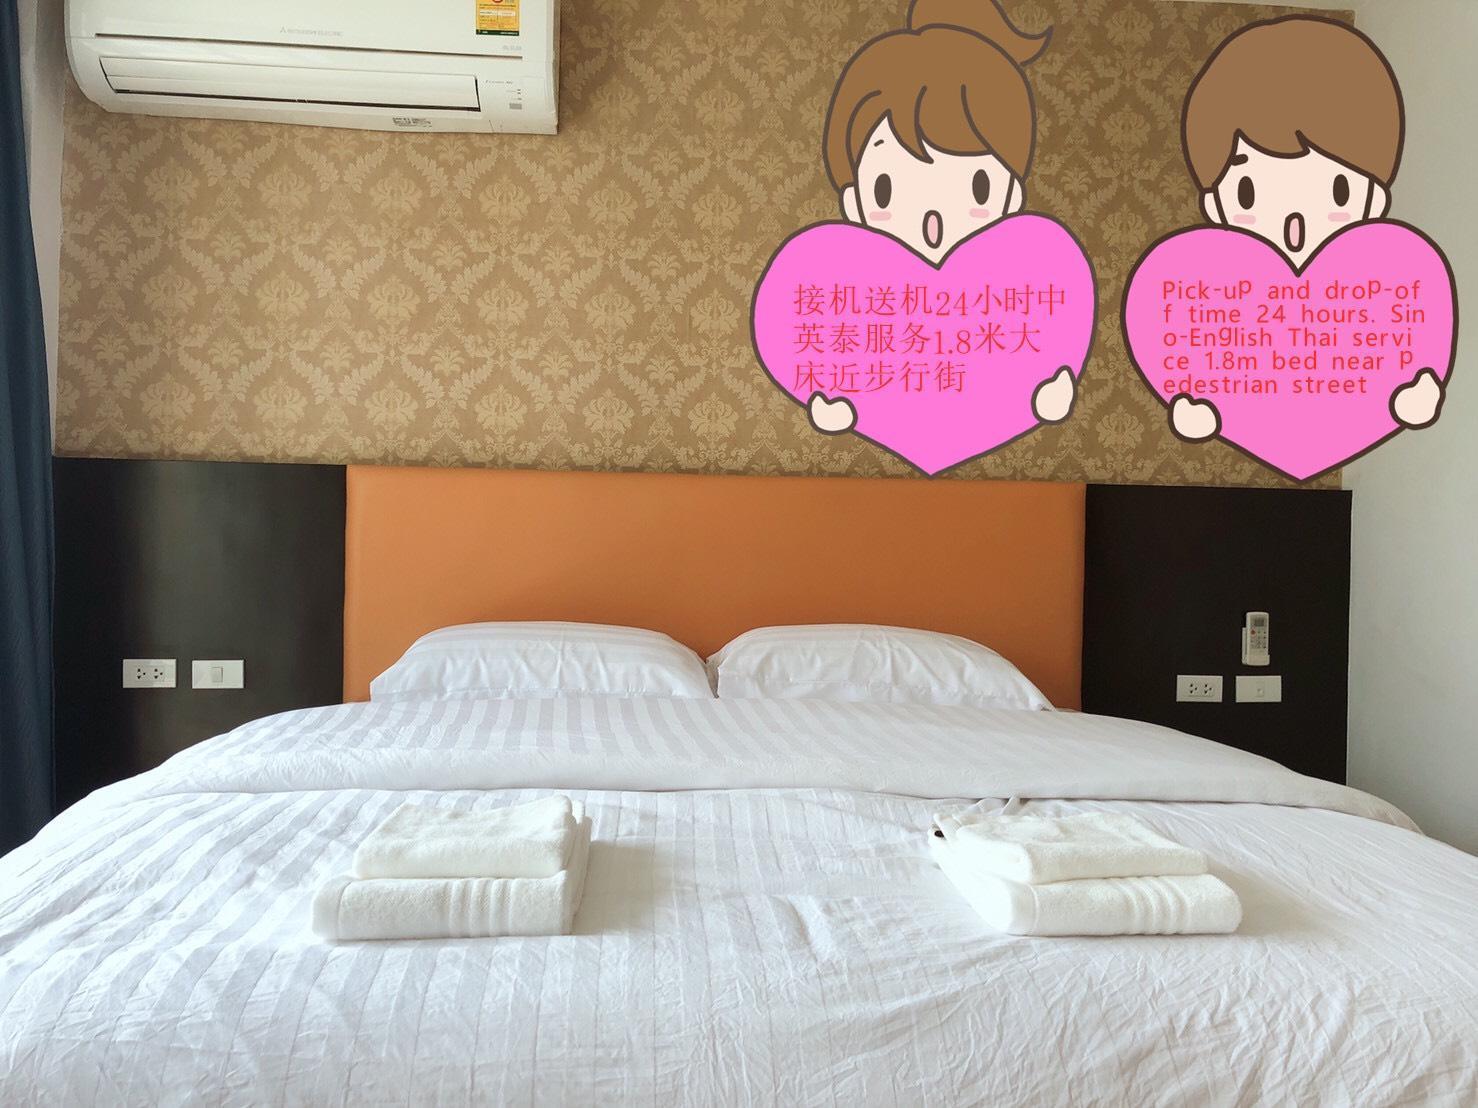 [hw]1.8m Double Room 36m2 Large Room 2 อพาร์ตเมนต์ 1 ห้องนอน 1 ห้องน้ำส่วนตัว ขนาด 36 ตร.ม. – พัทยากลาง